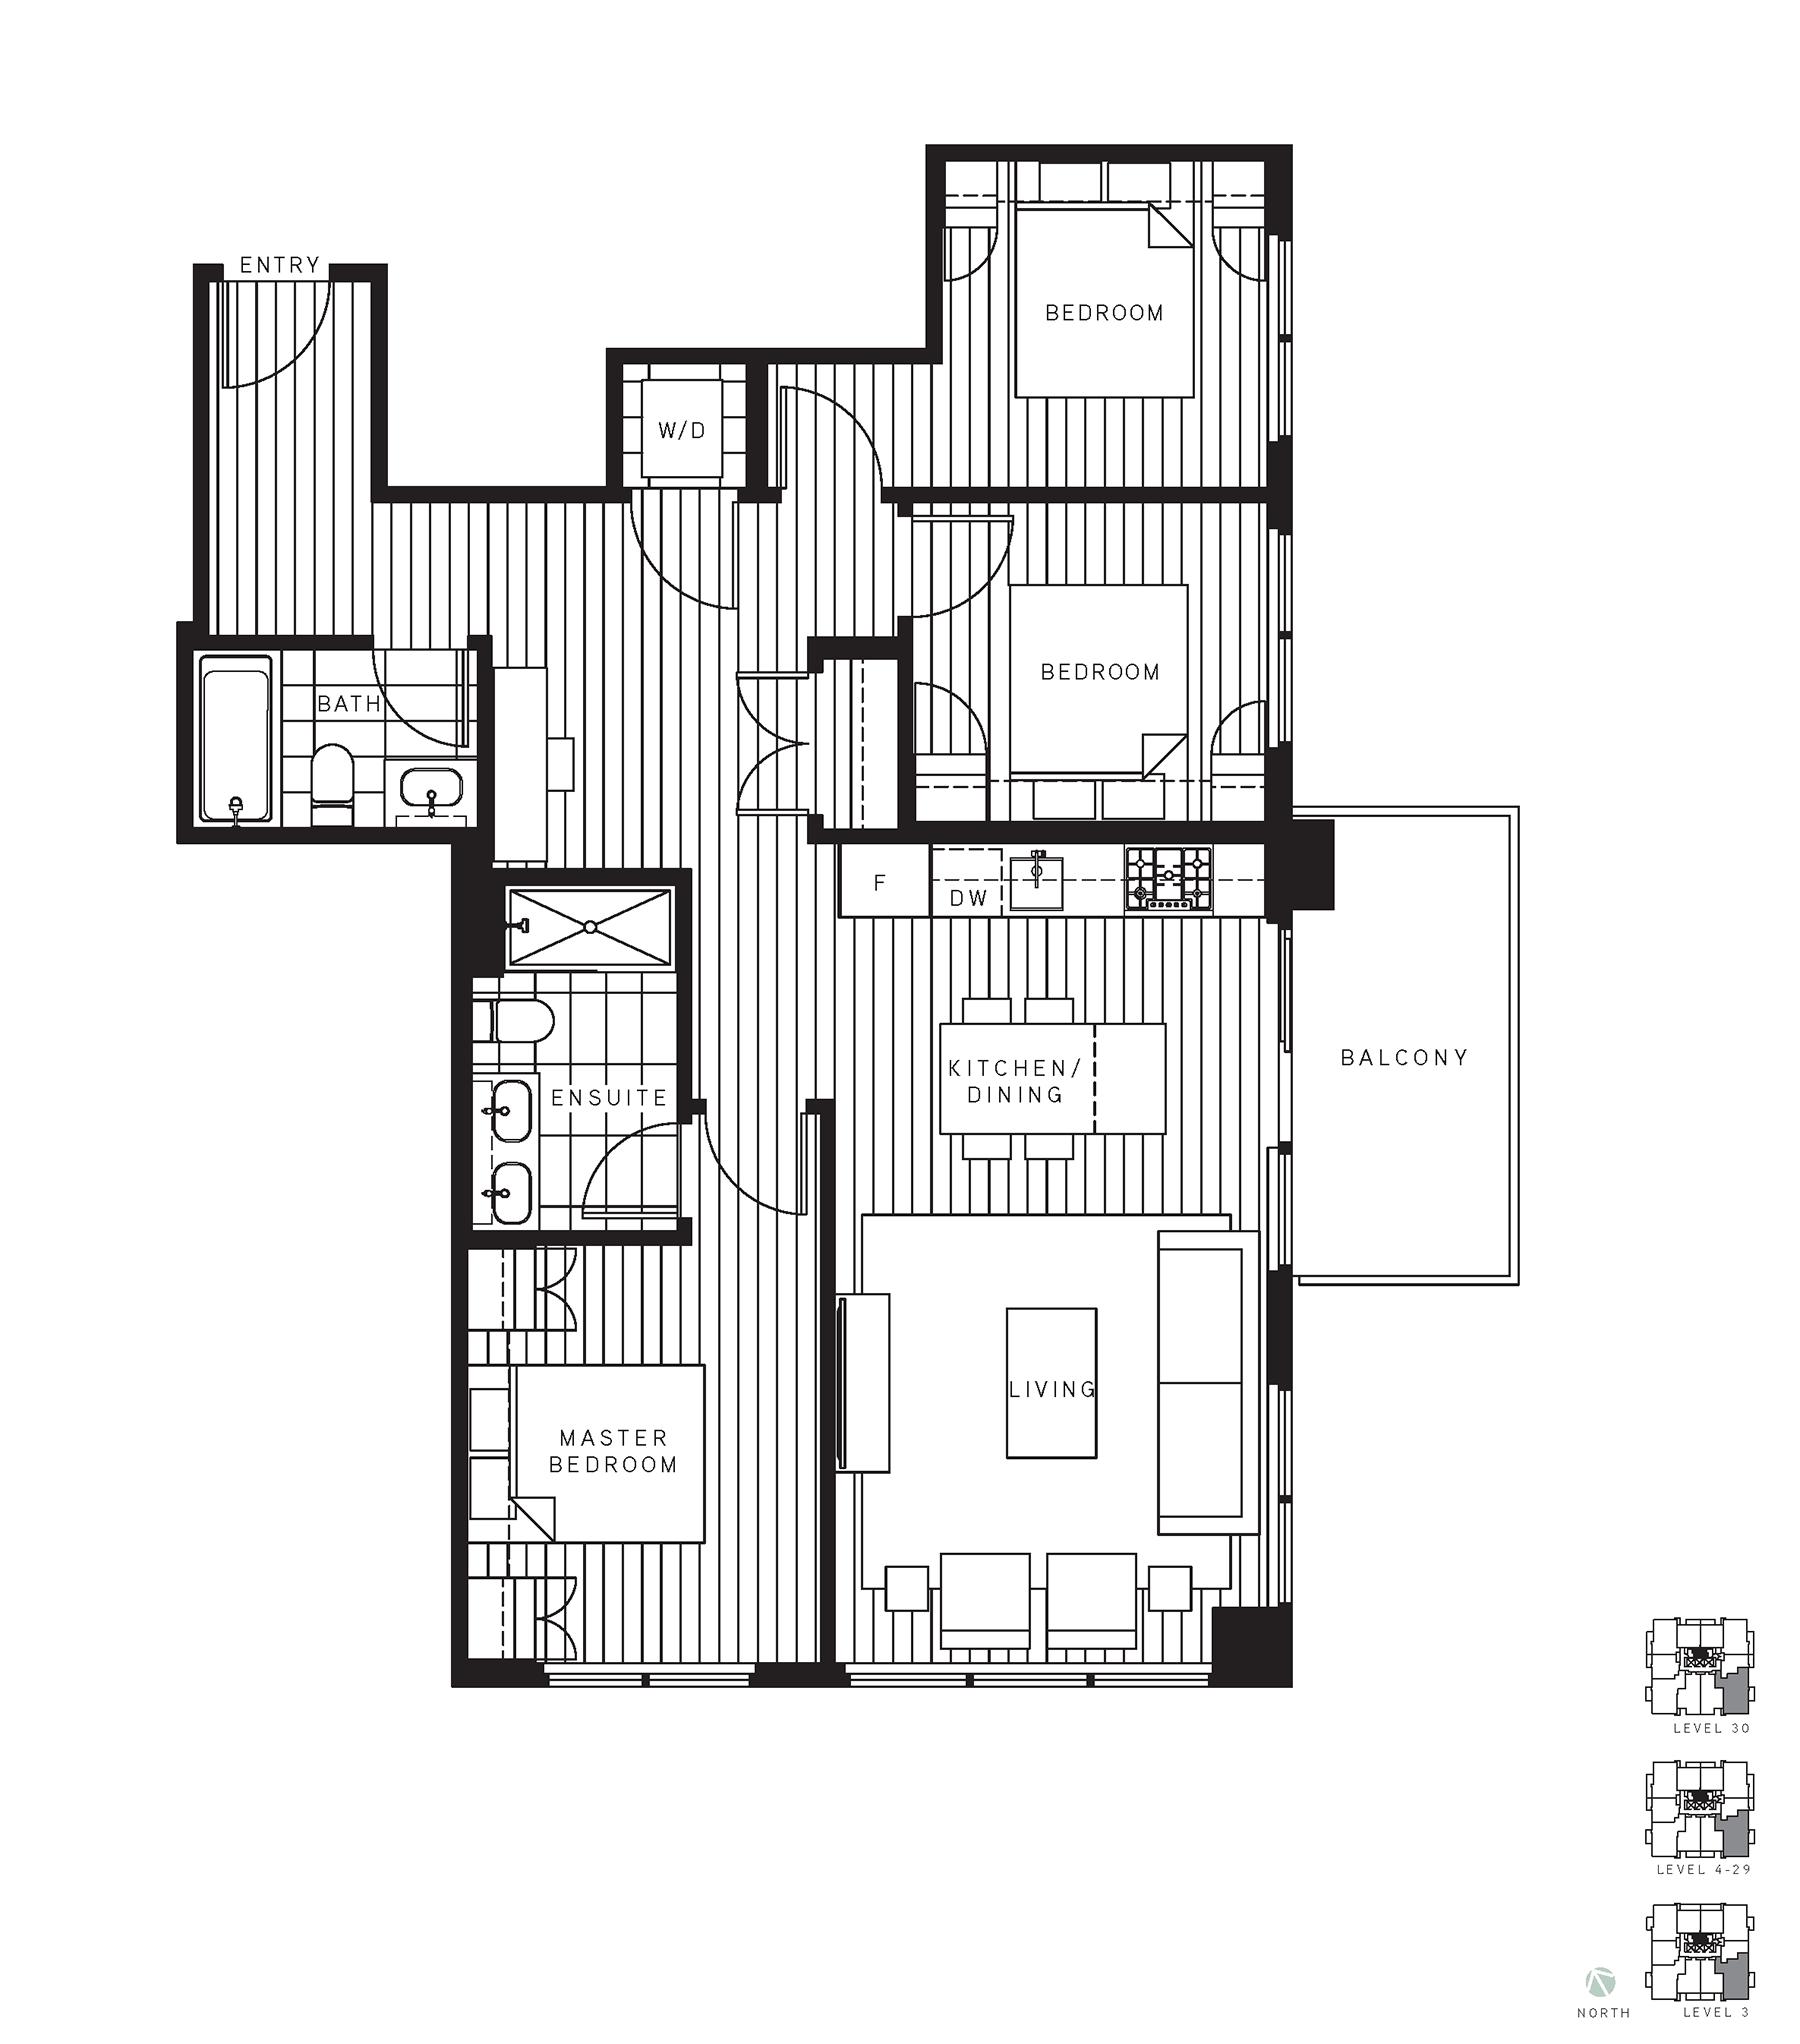 Maywood Floorplan G